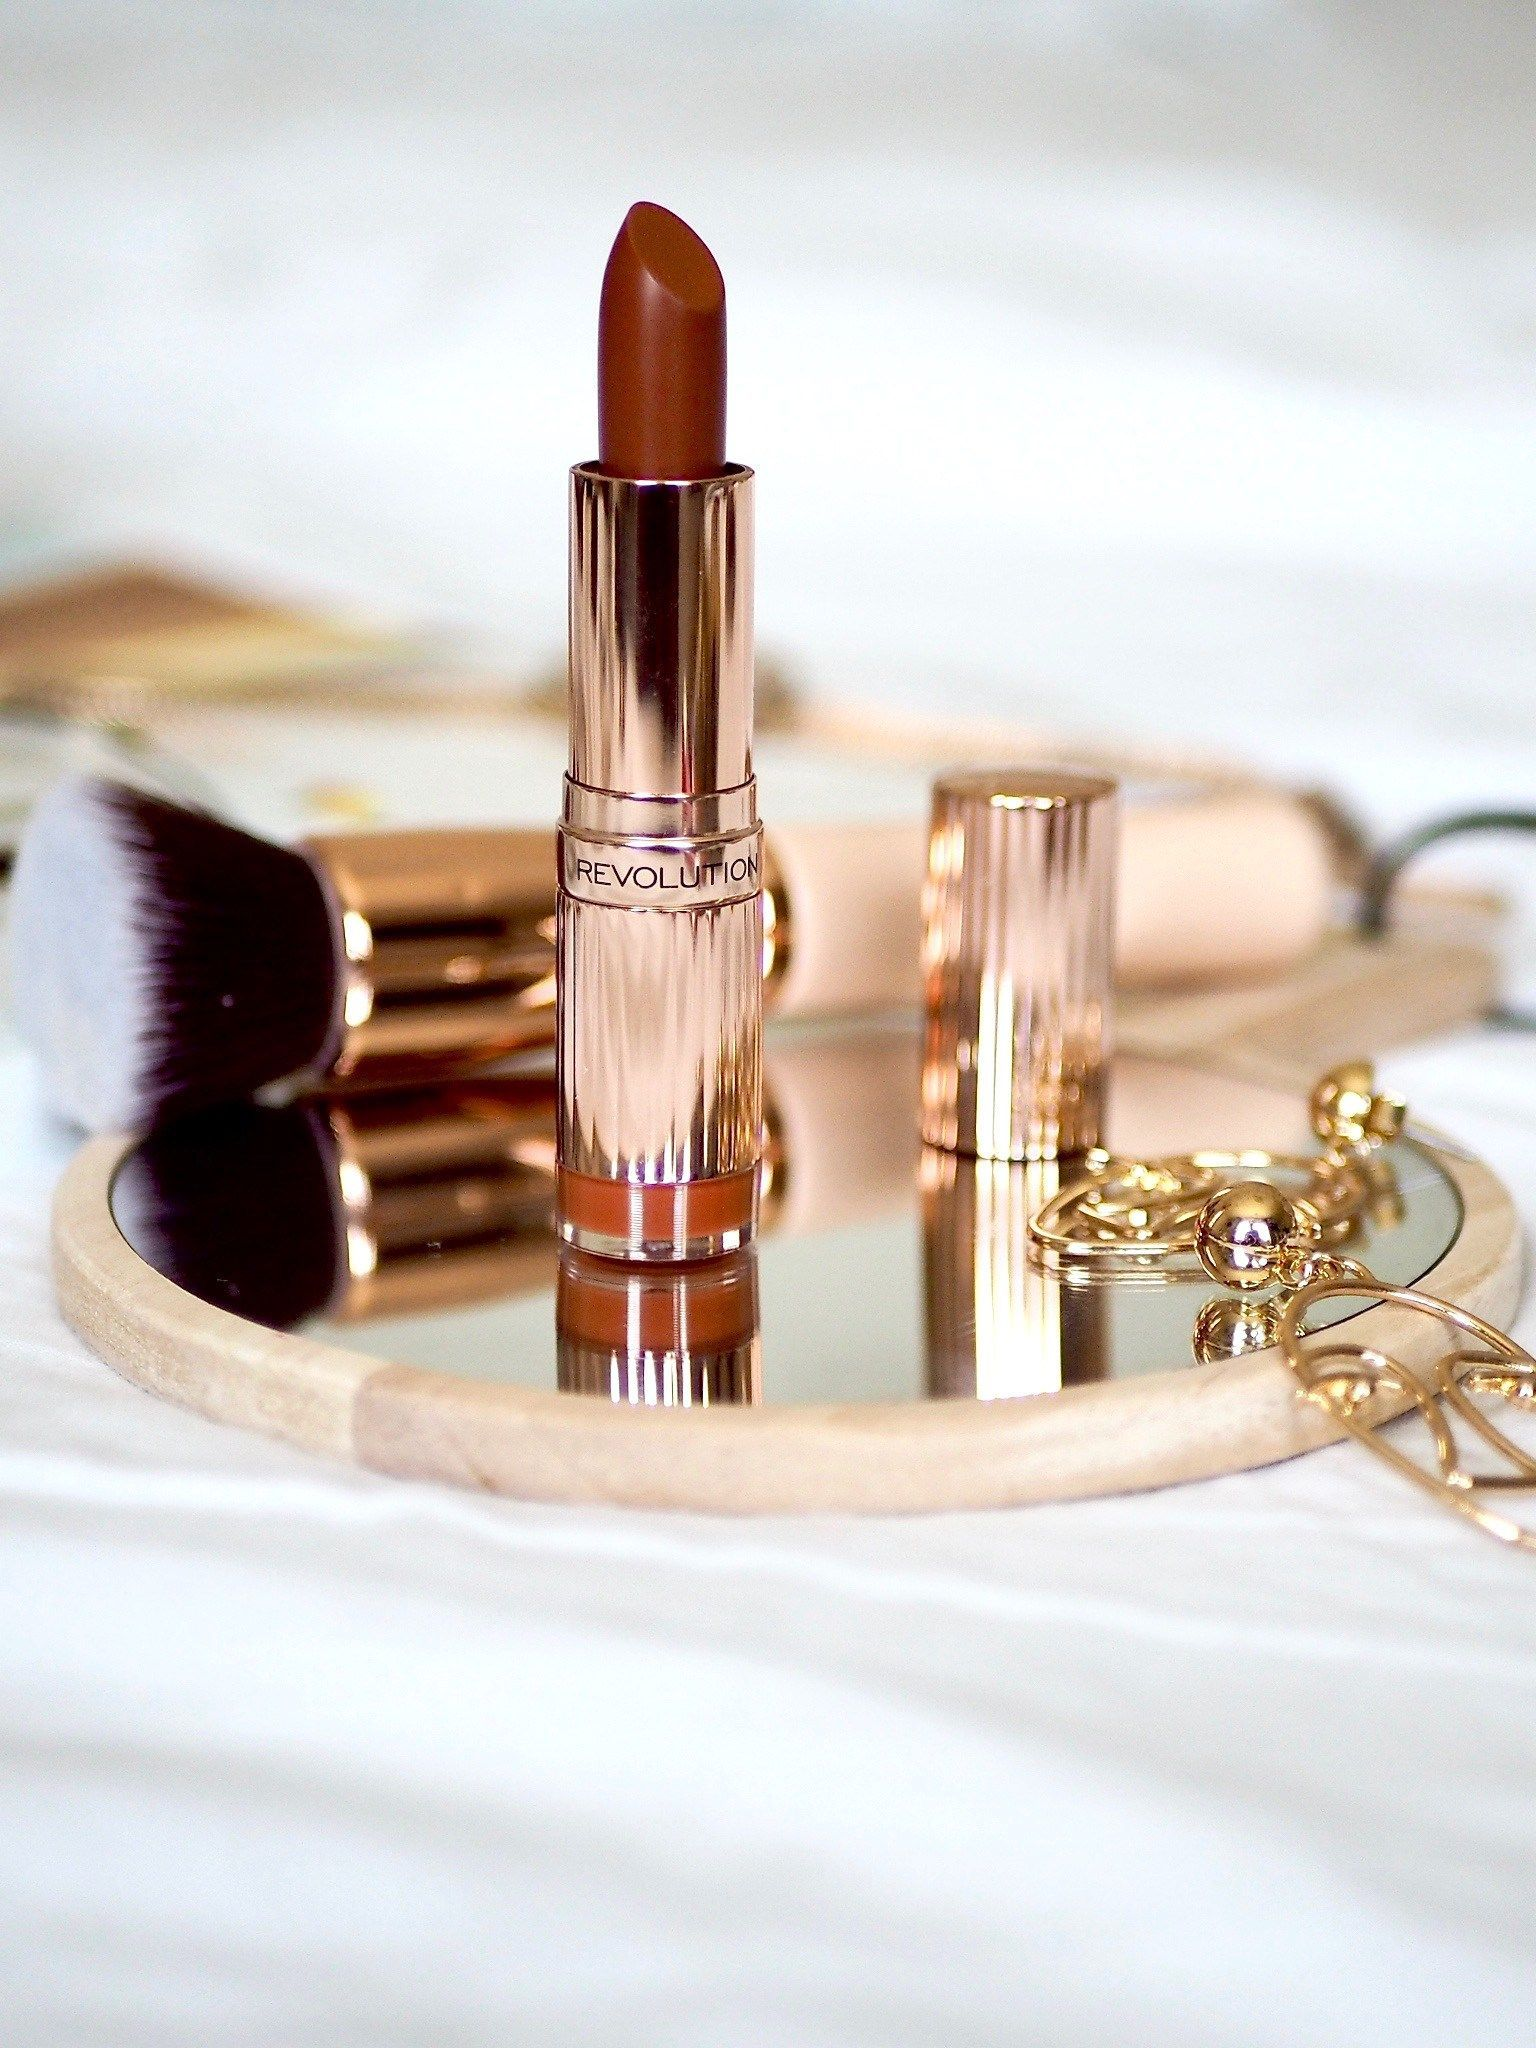 Best Drugstore Orange Lipsticks! - Aye Lined Pinterest, Beauty, Lifestyle -